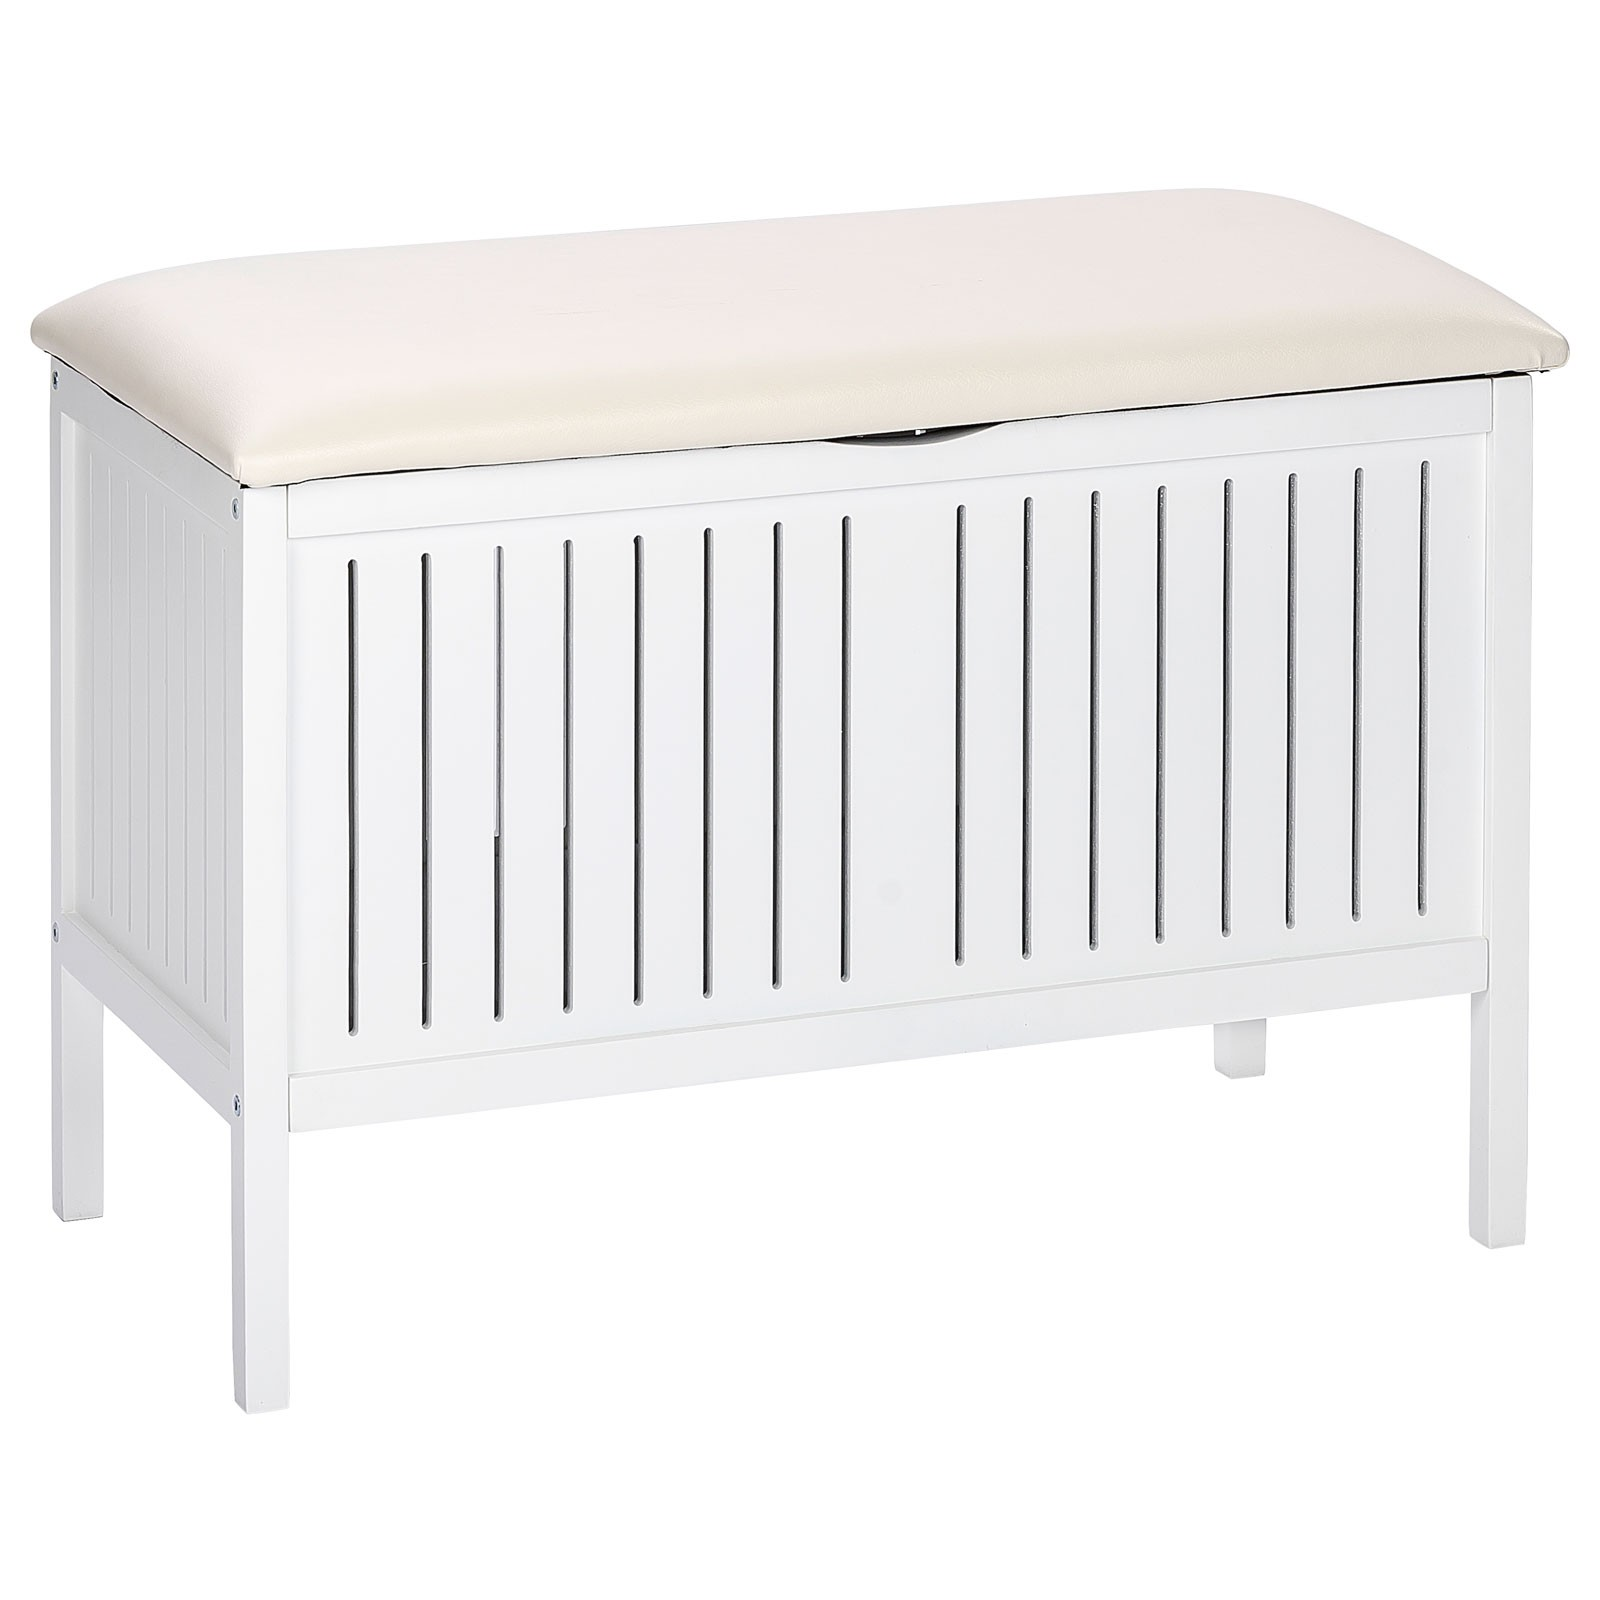 wohnbank wenko oslo weiss. Black Bedroom Furniture Sets. Home Design Ideas